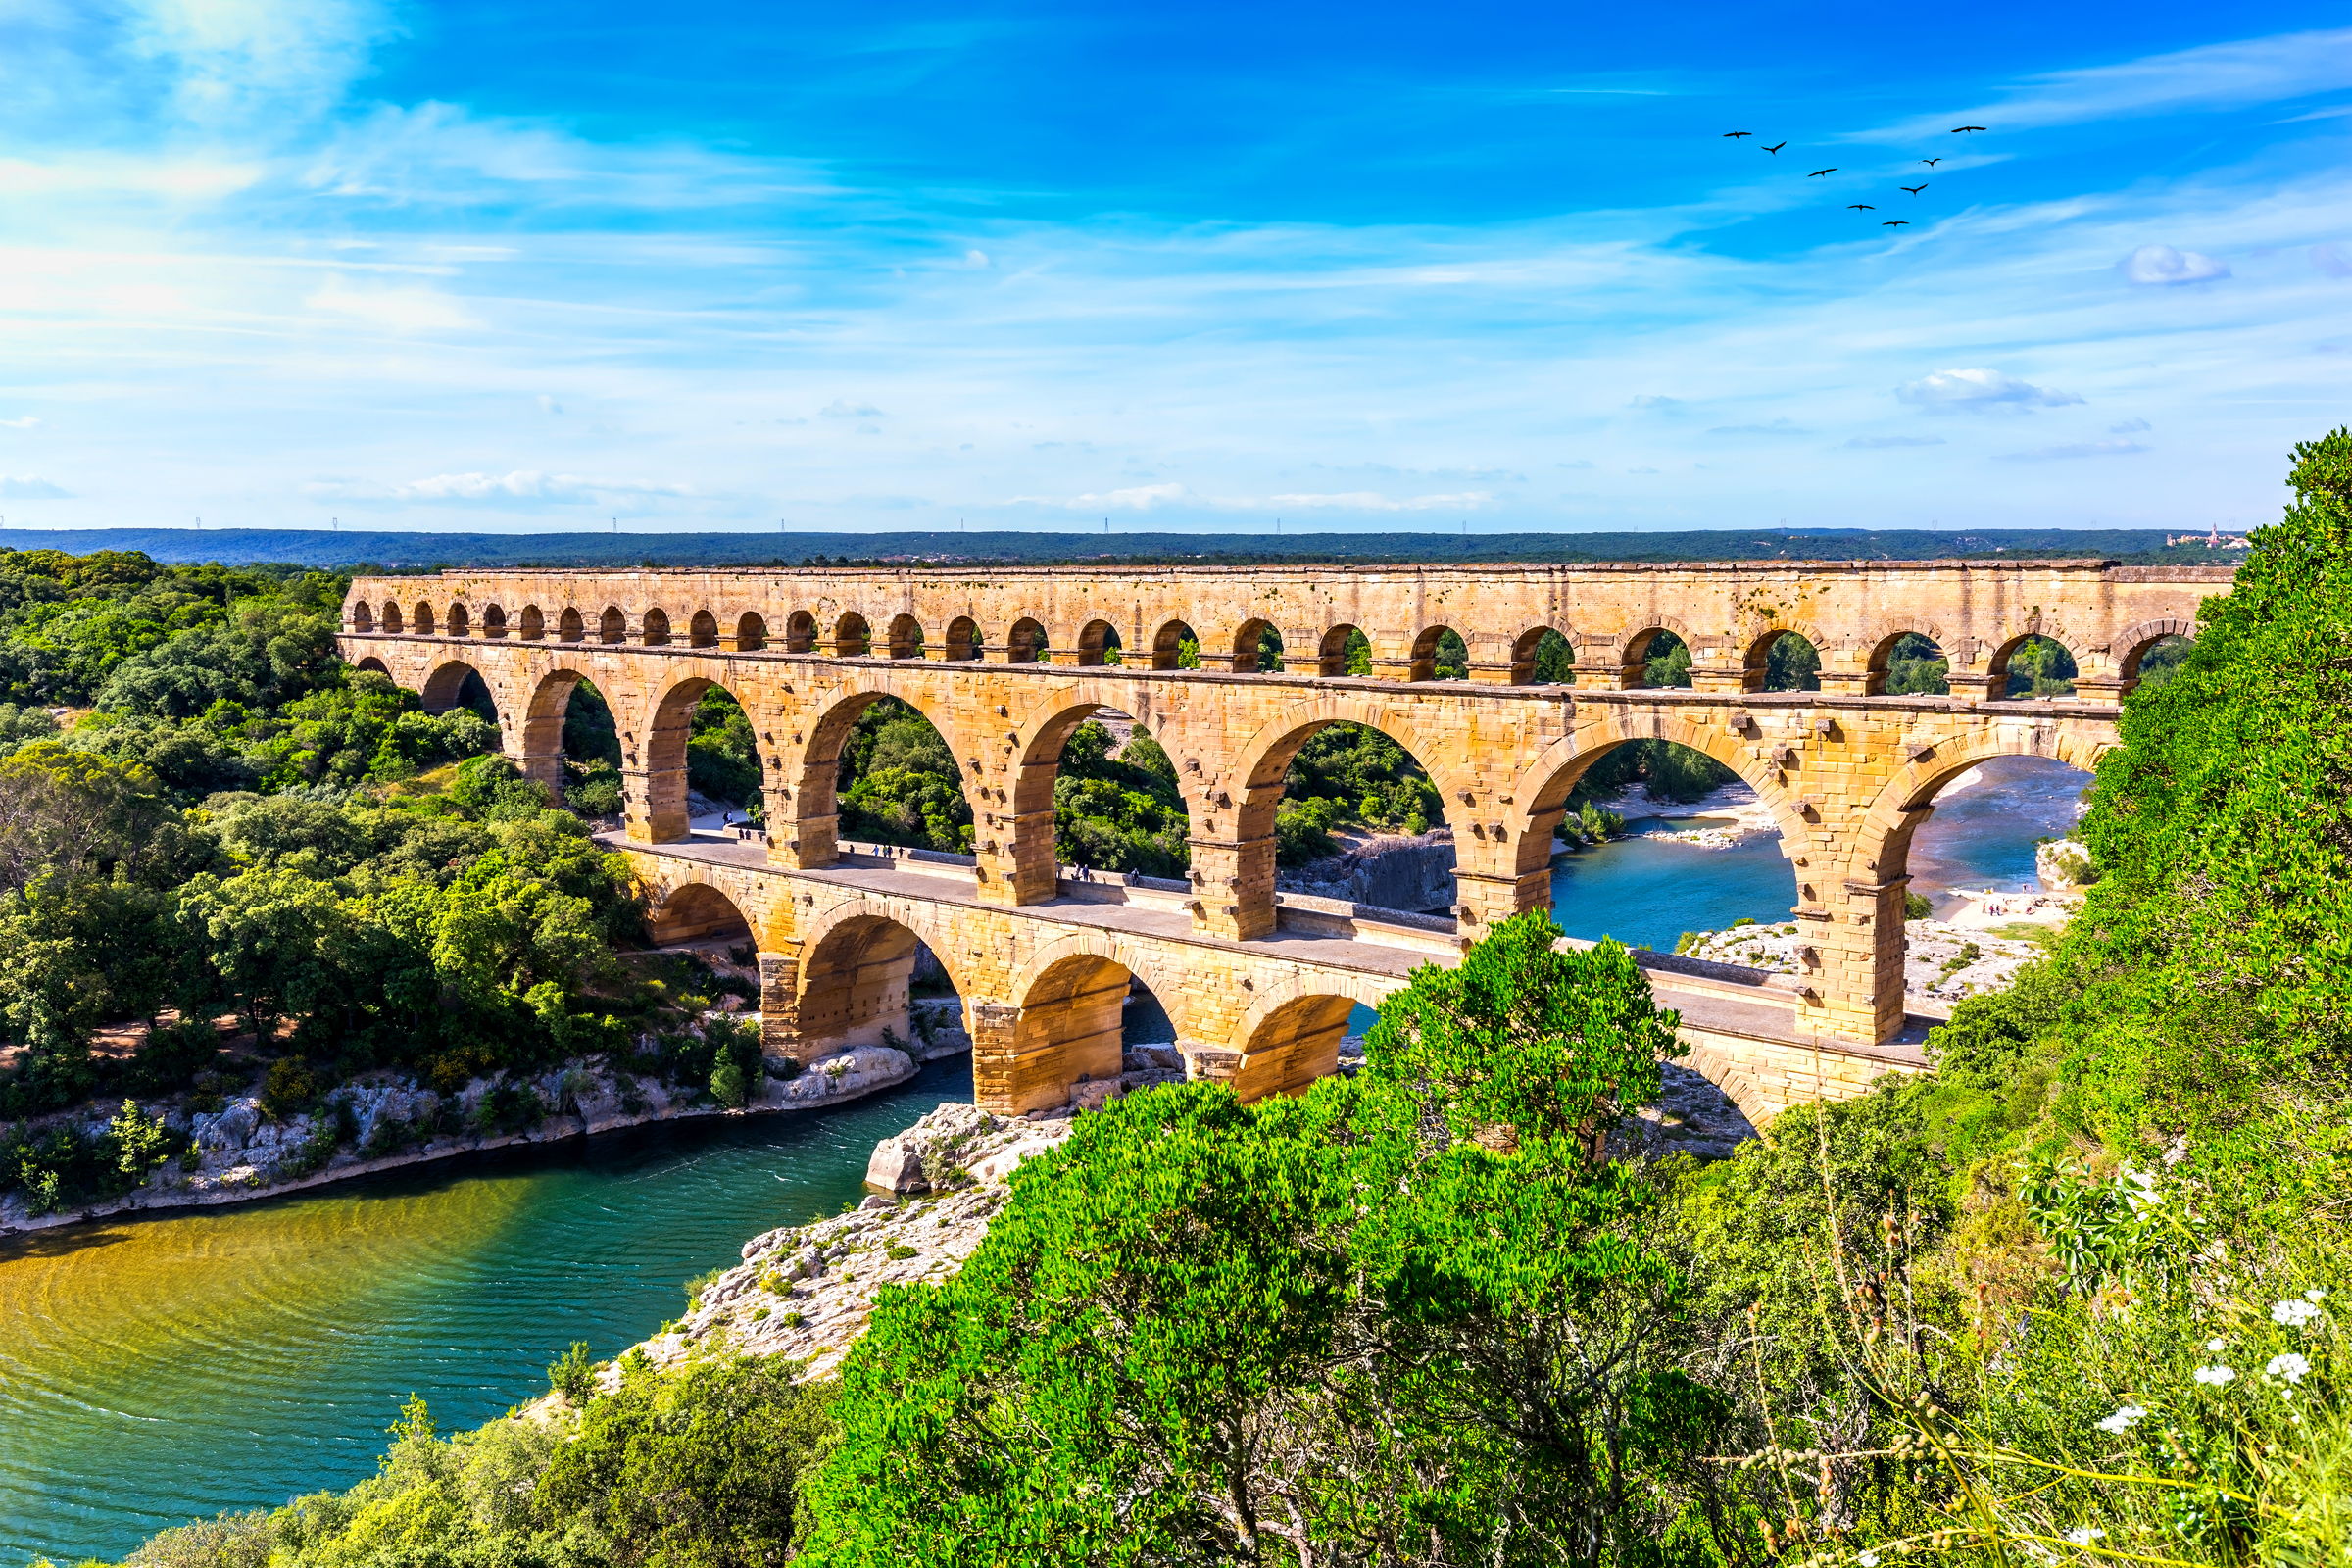 Pont du Gard Aqueduct in Gard, France